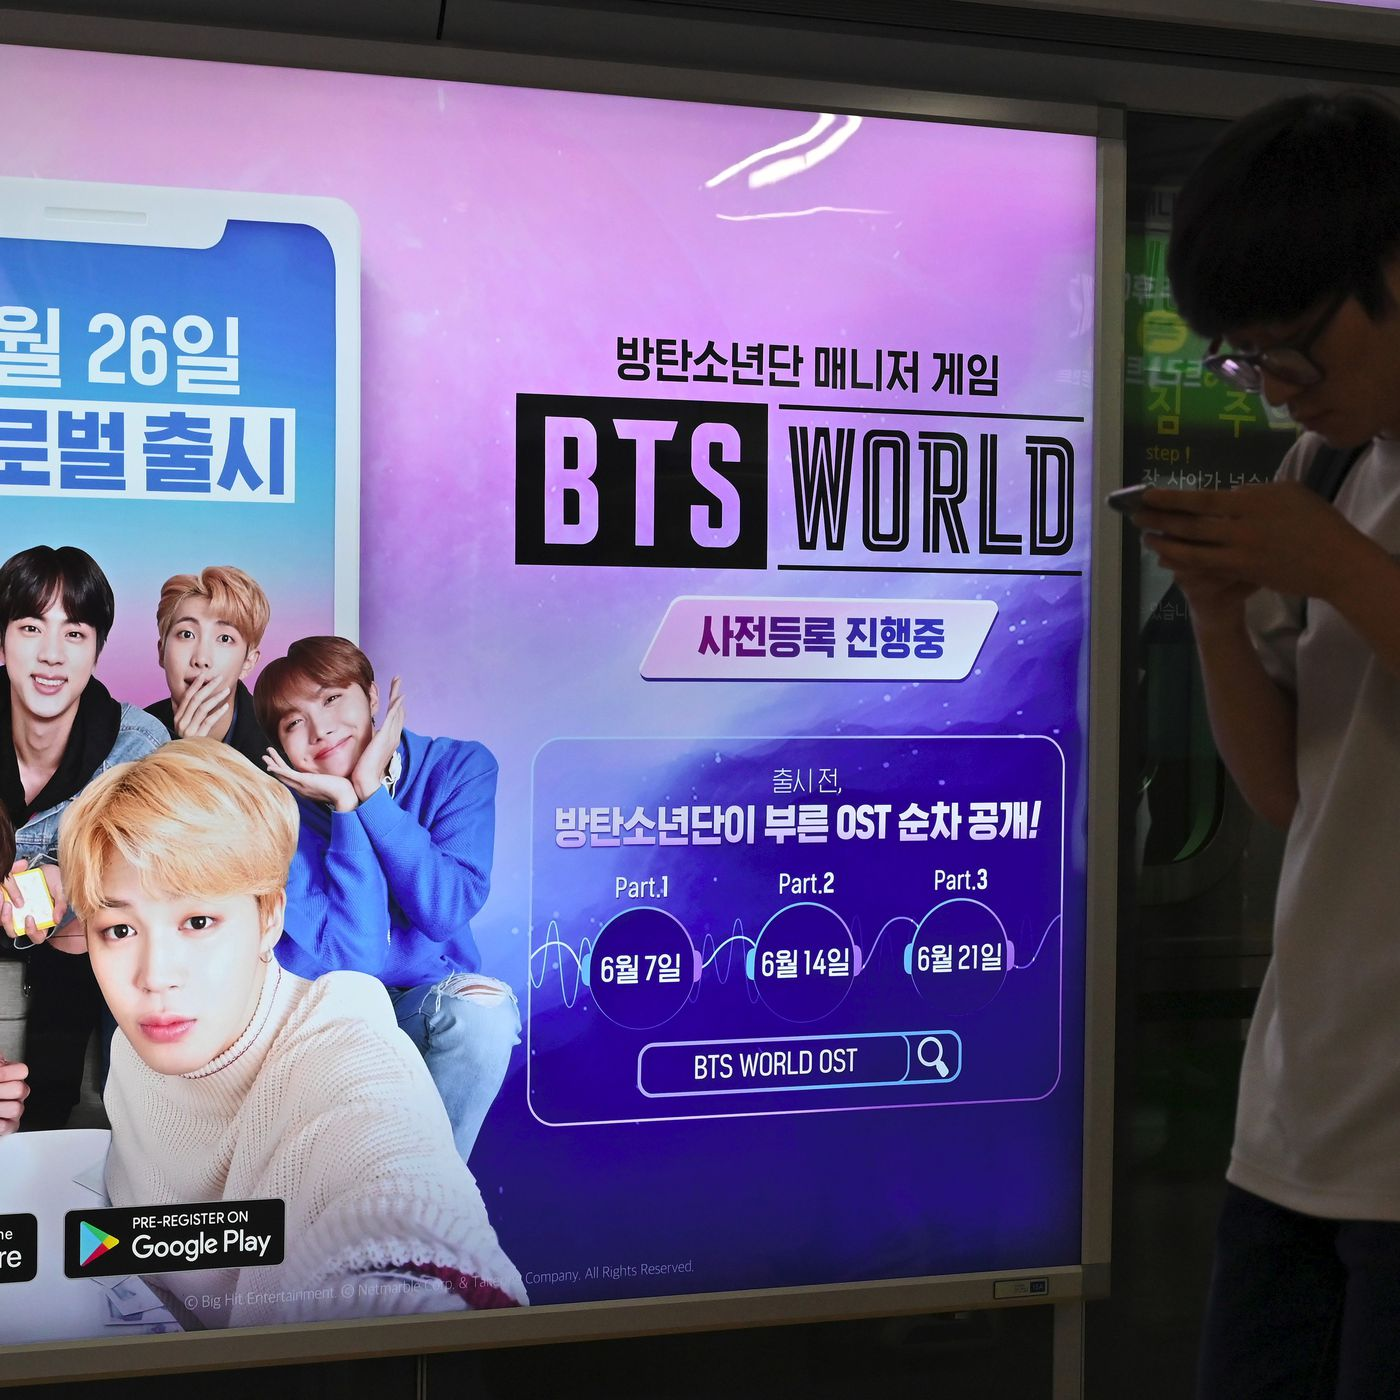 How the mobile game BTS World escalates K-pop's parasocial